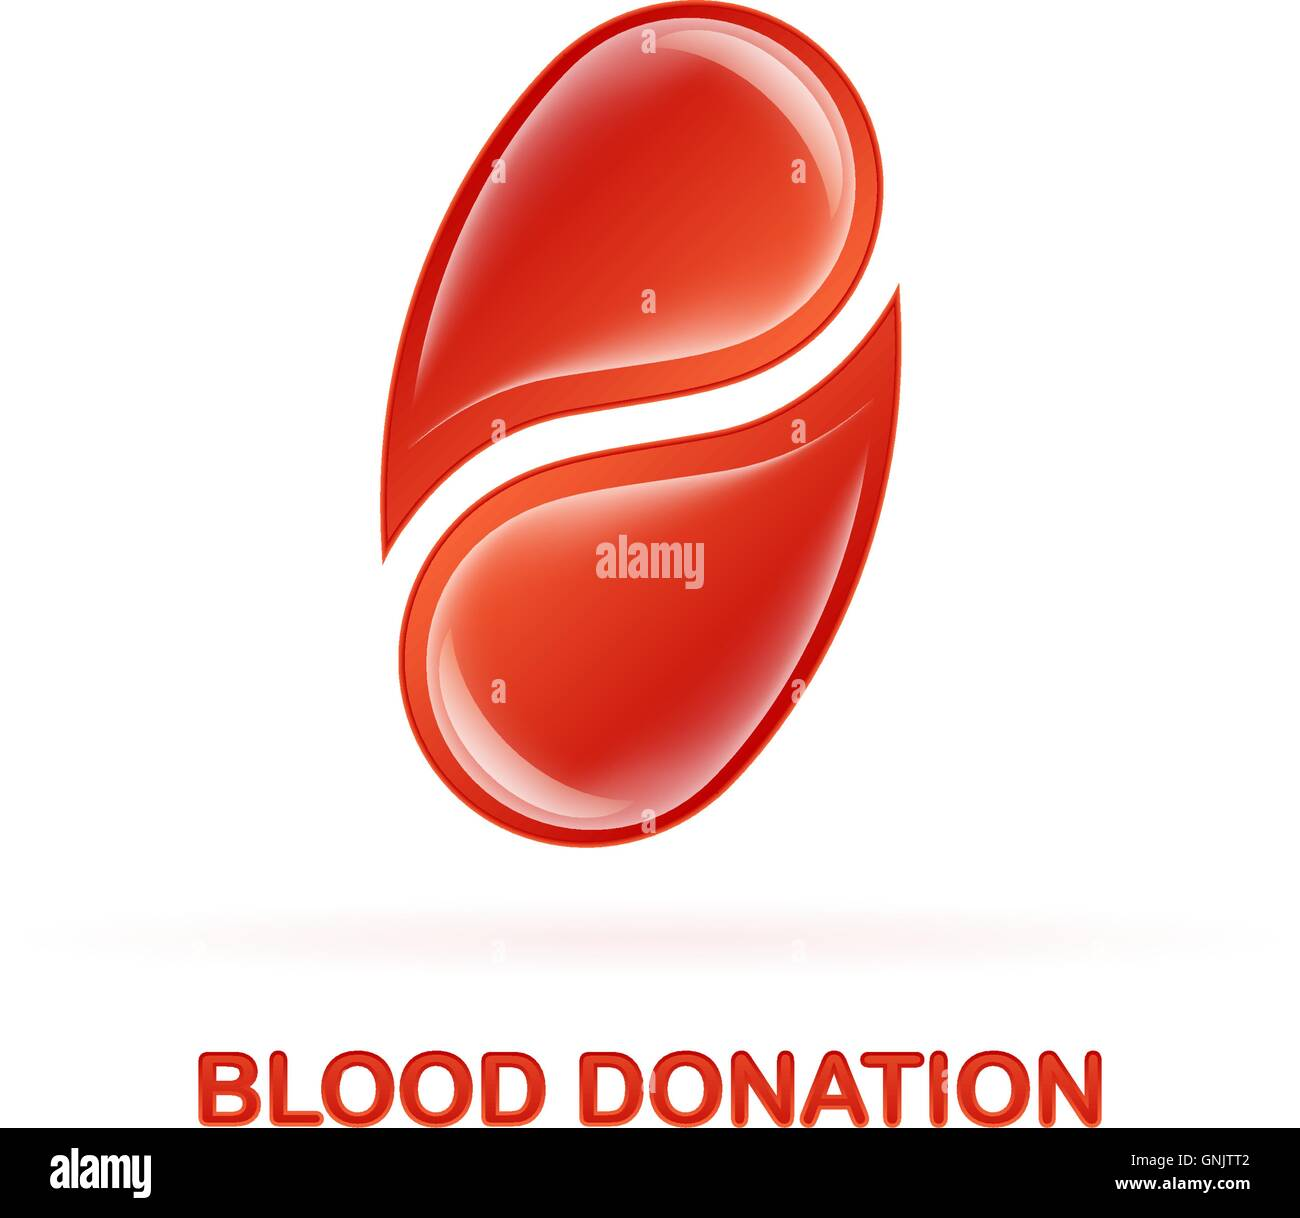 Blood donation logo stock vector art illustration vector image blood donation logo buycottarizona